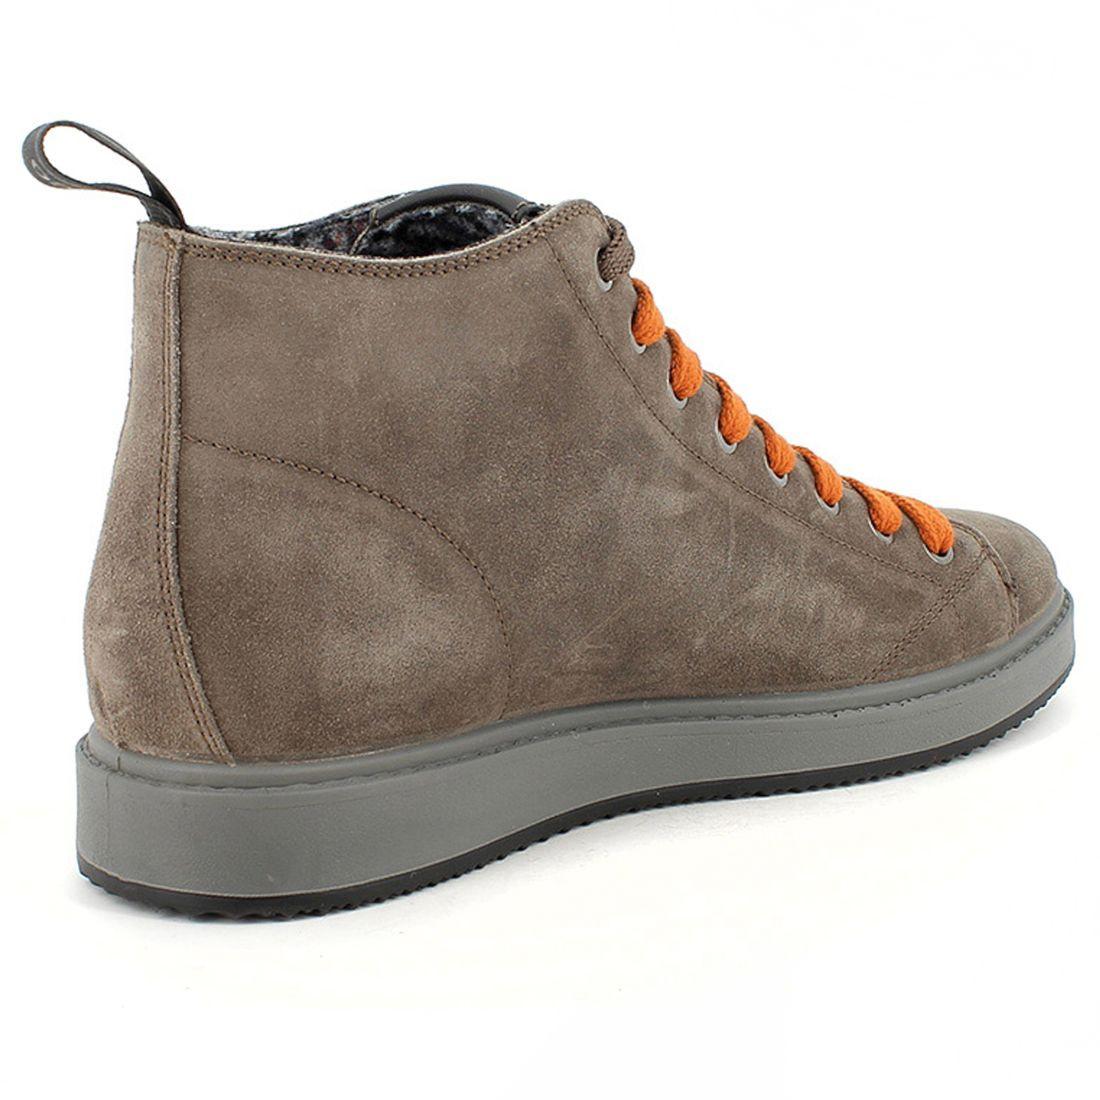 sneakers uomo igico santiago8124733 9027